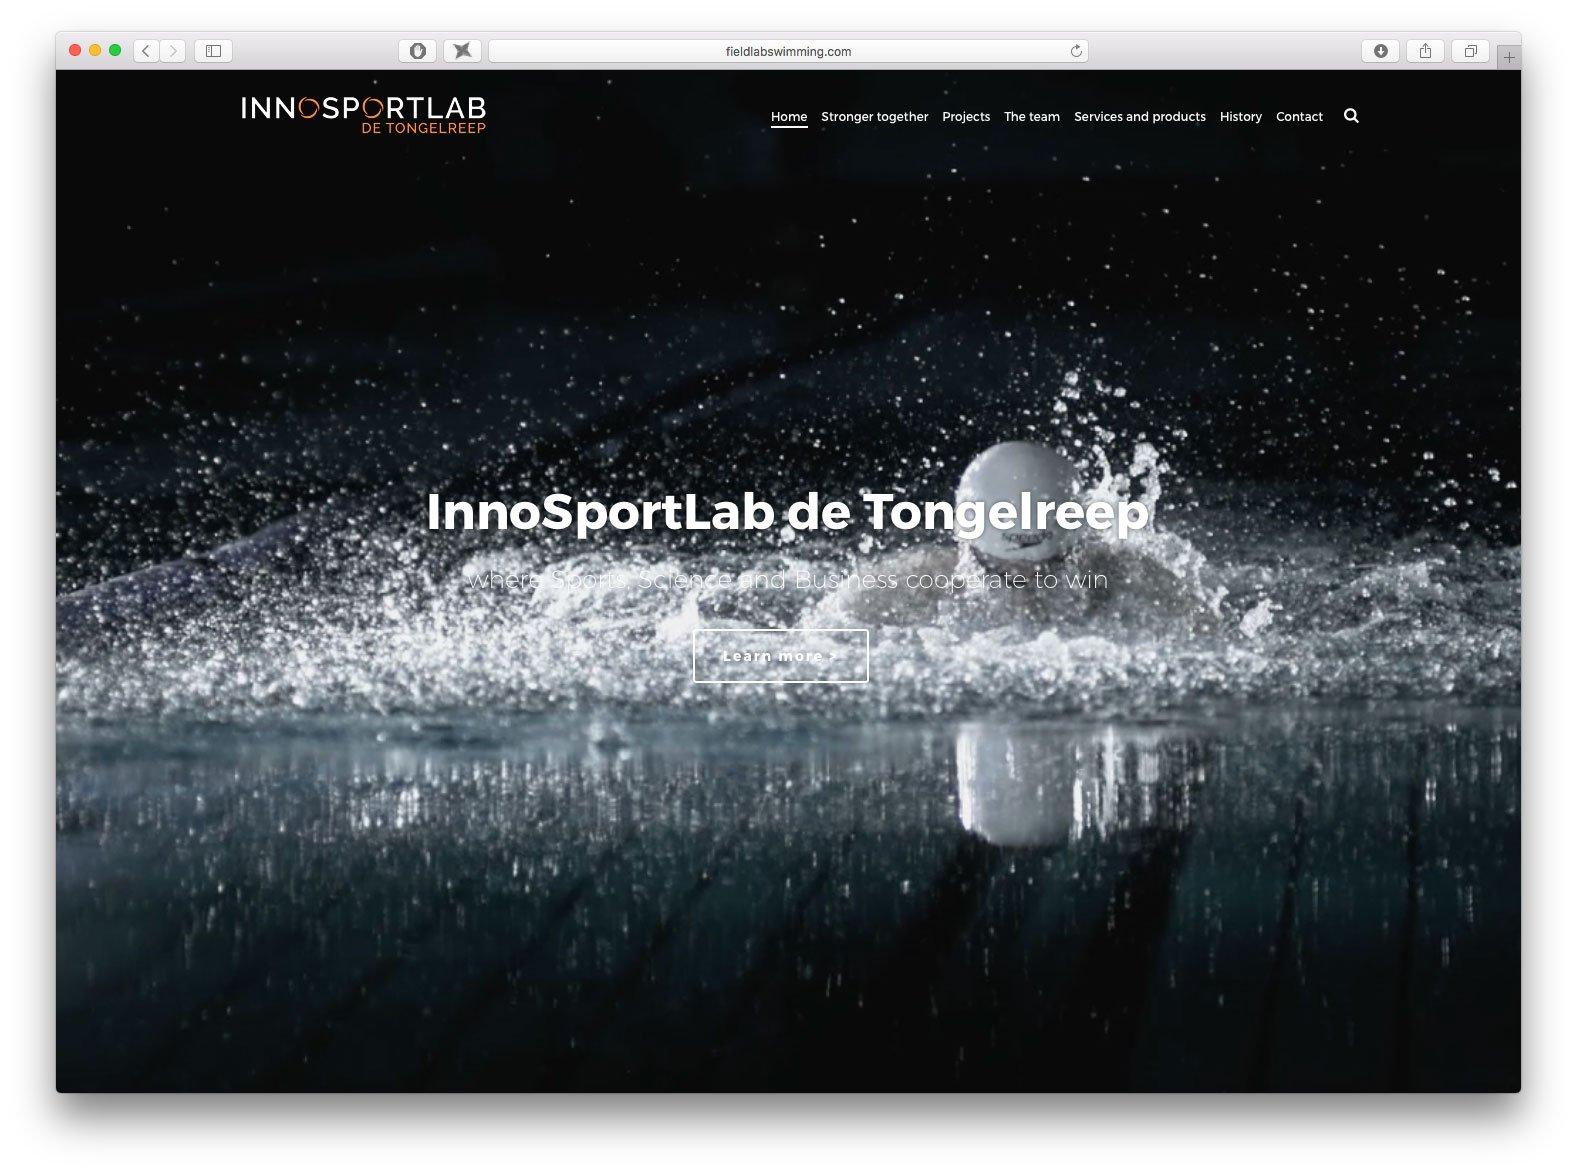 innosportlab1